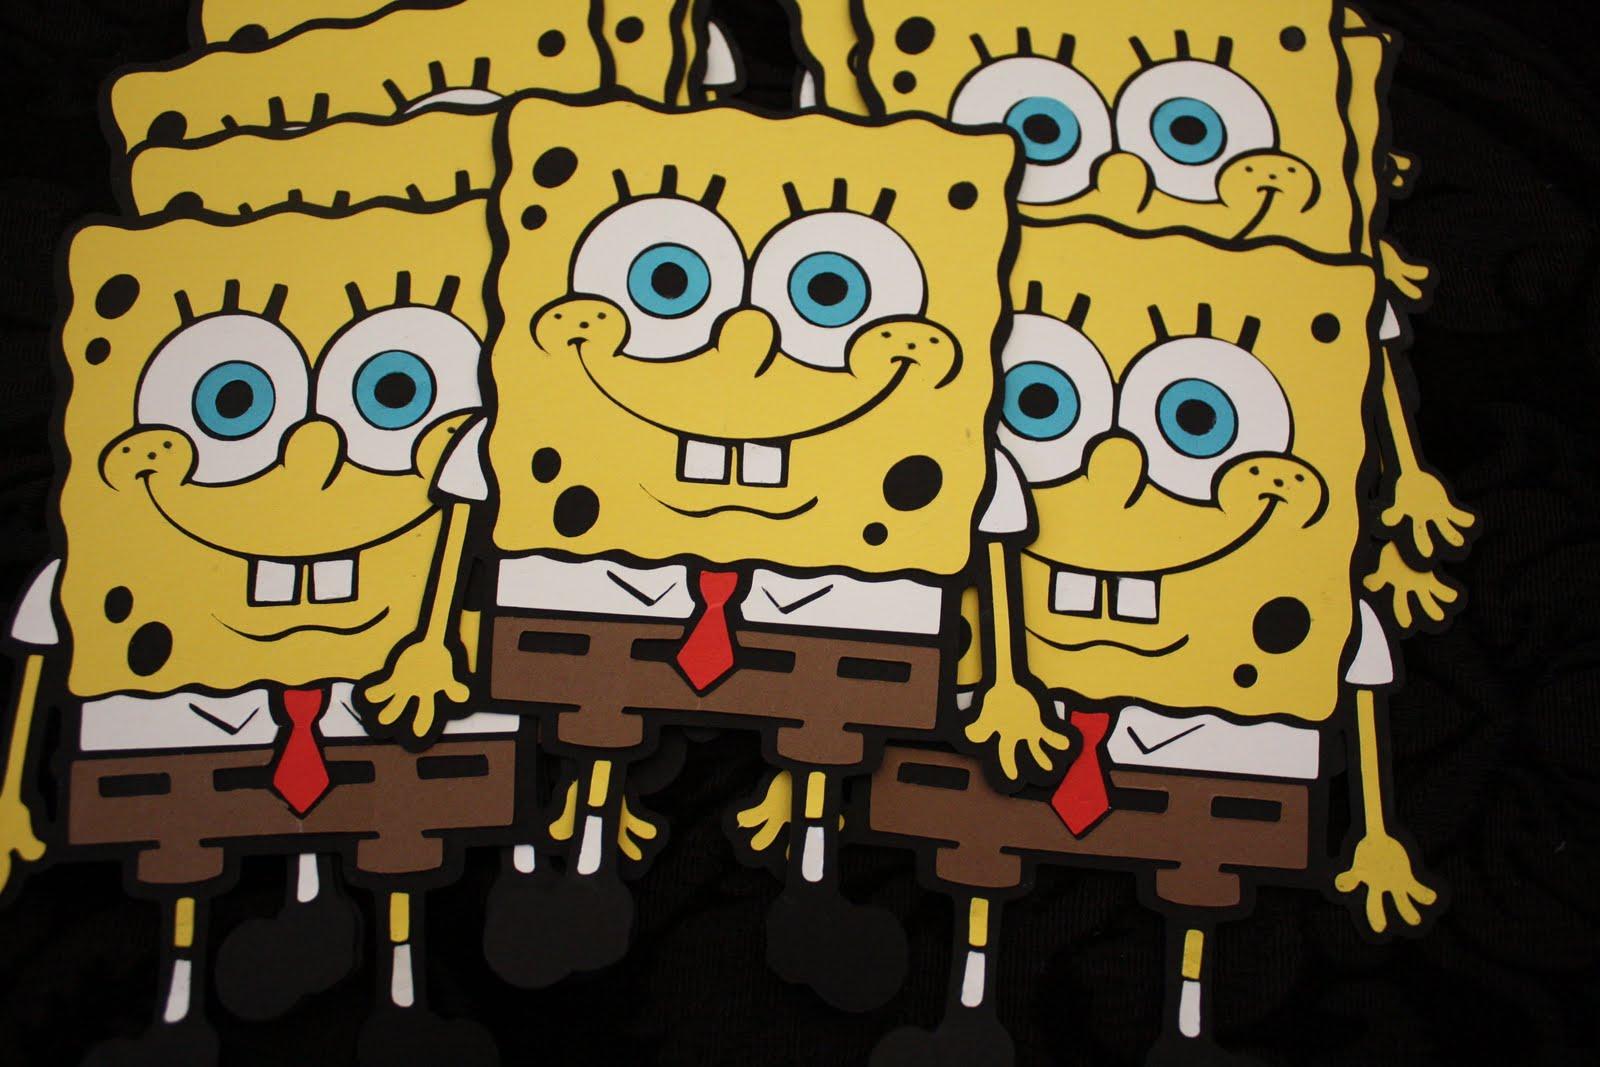 Wonderful spongebob party invitations pictures inspiration bella scrapbook designs spongebob invites solutioingenieria Gallery